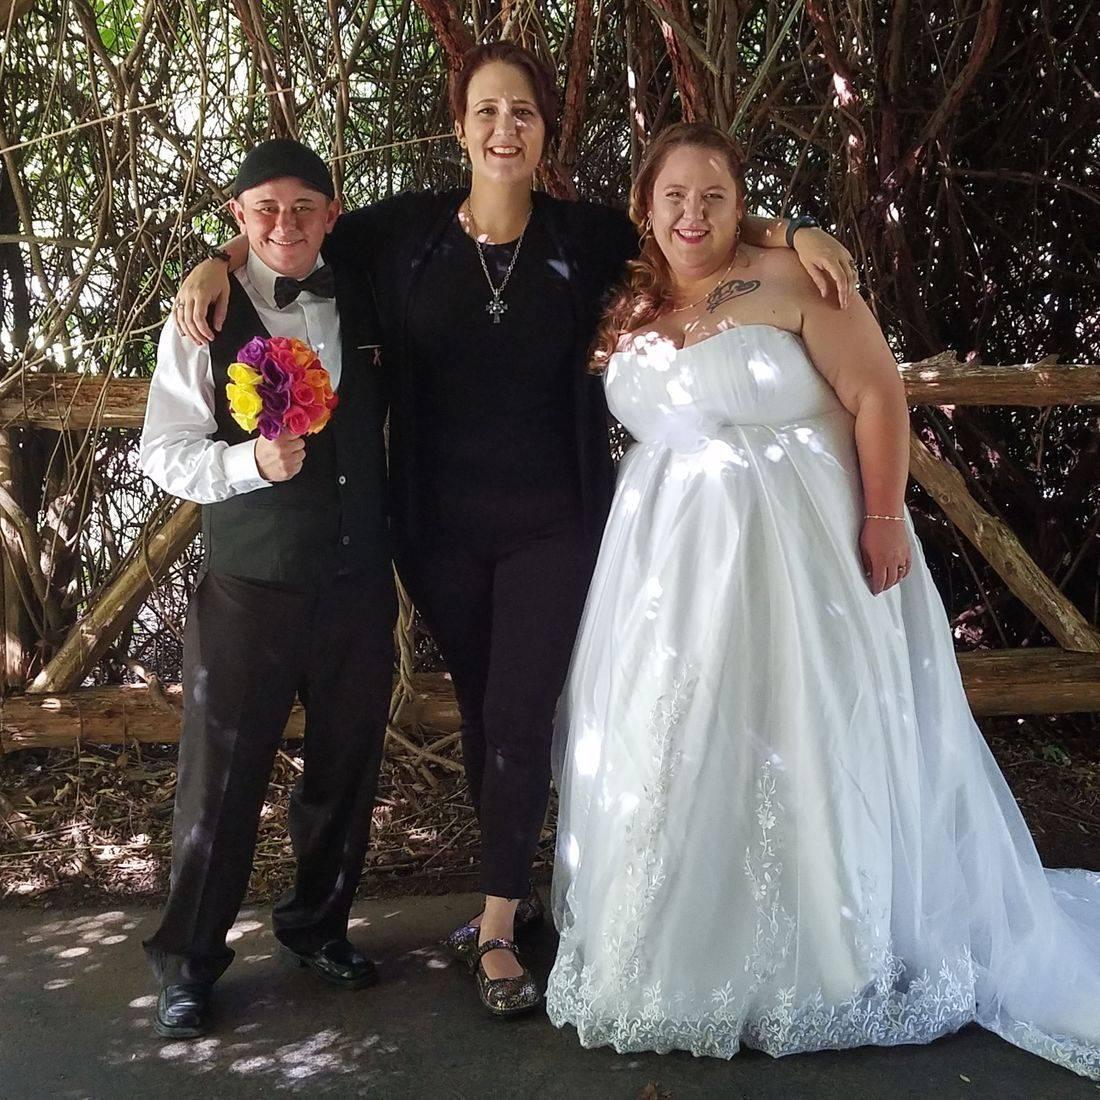 lgbtq, sloan park, mt ulla, officiant, wedding, celebrant, minister, outdoor wedding